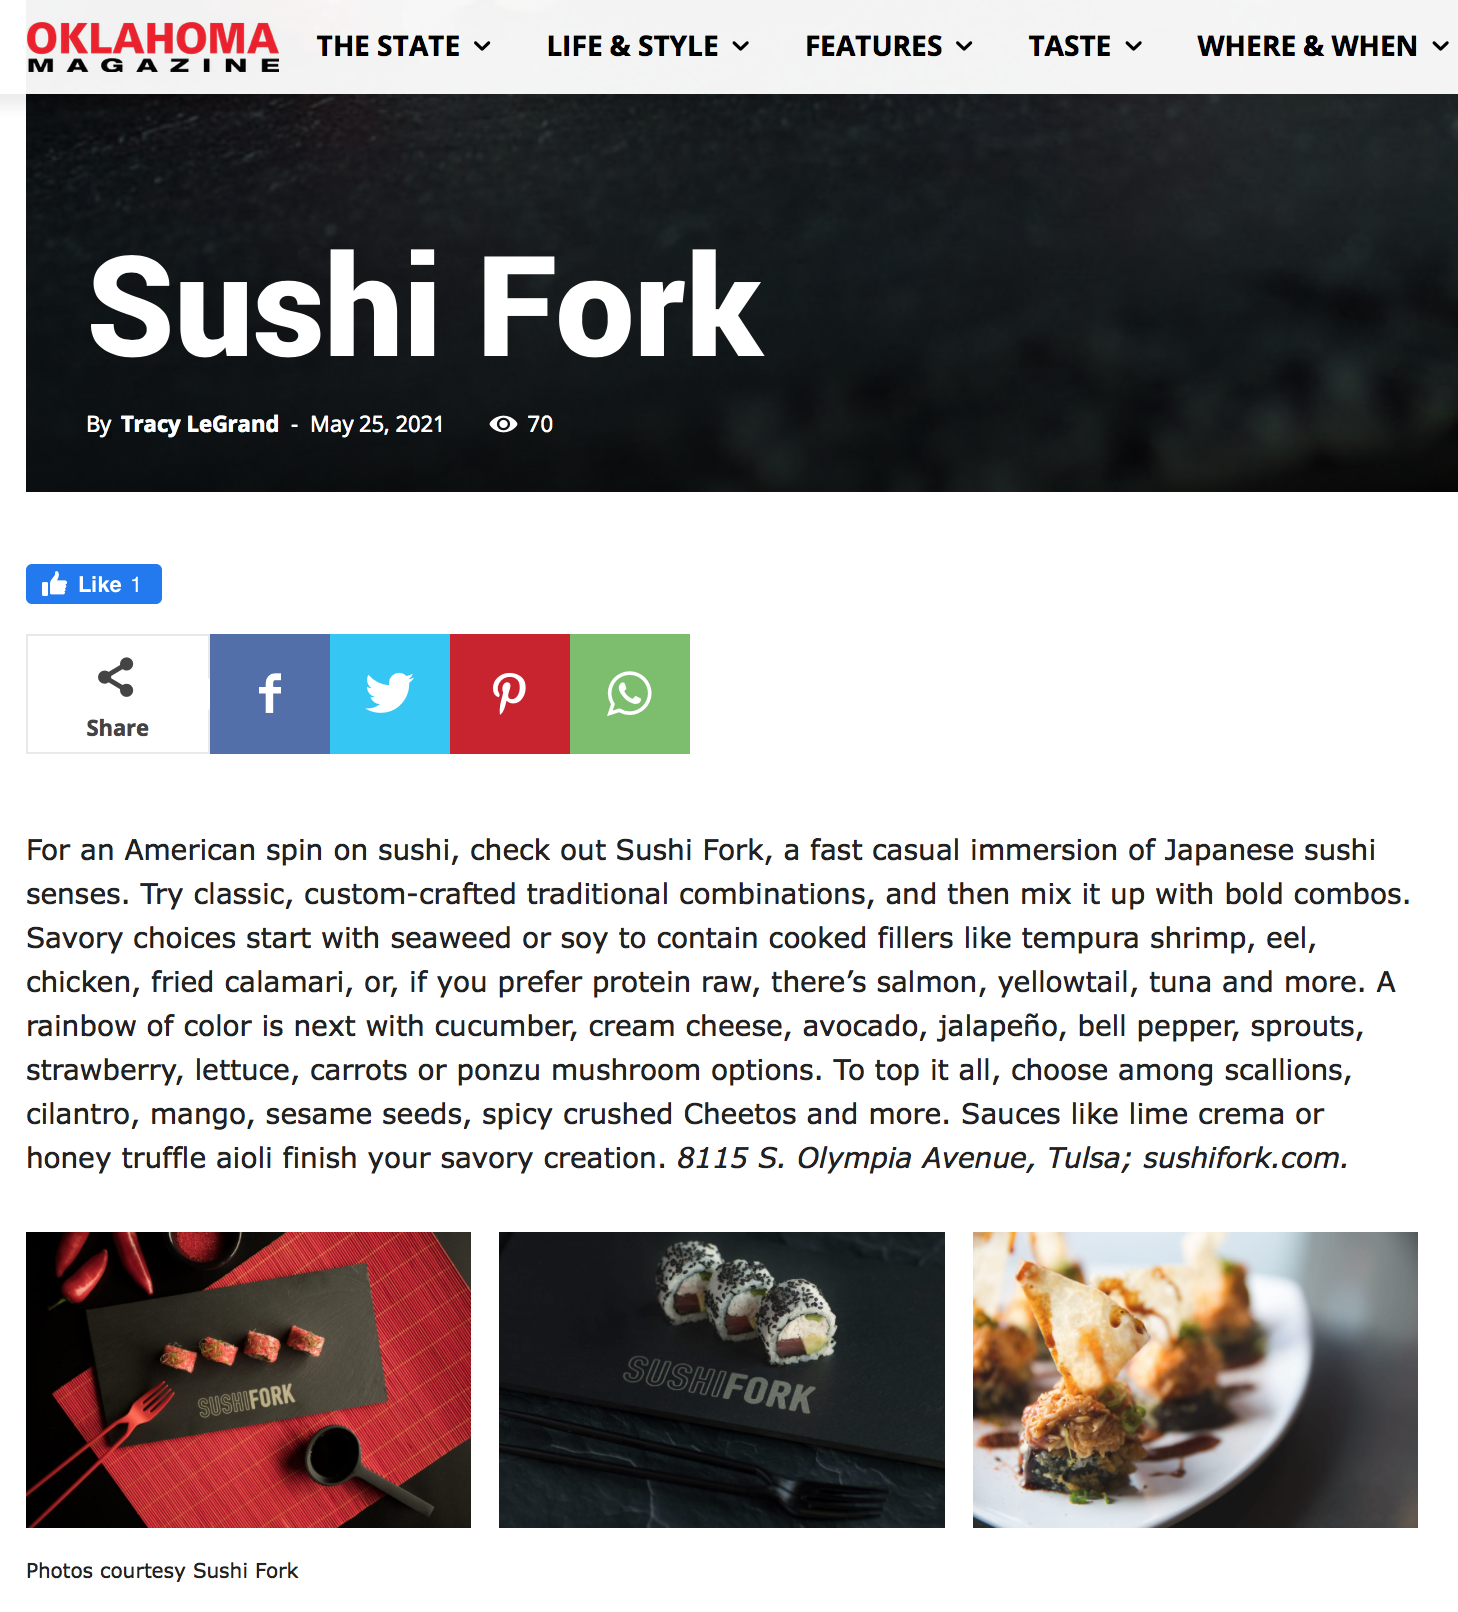 sushifork-okmag-article